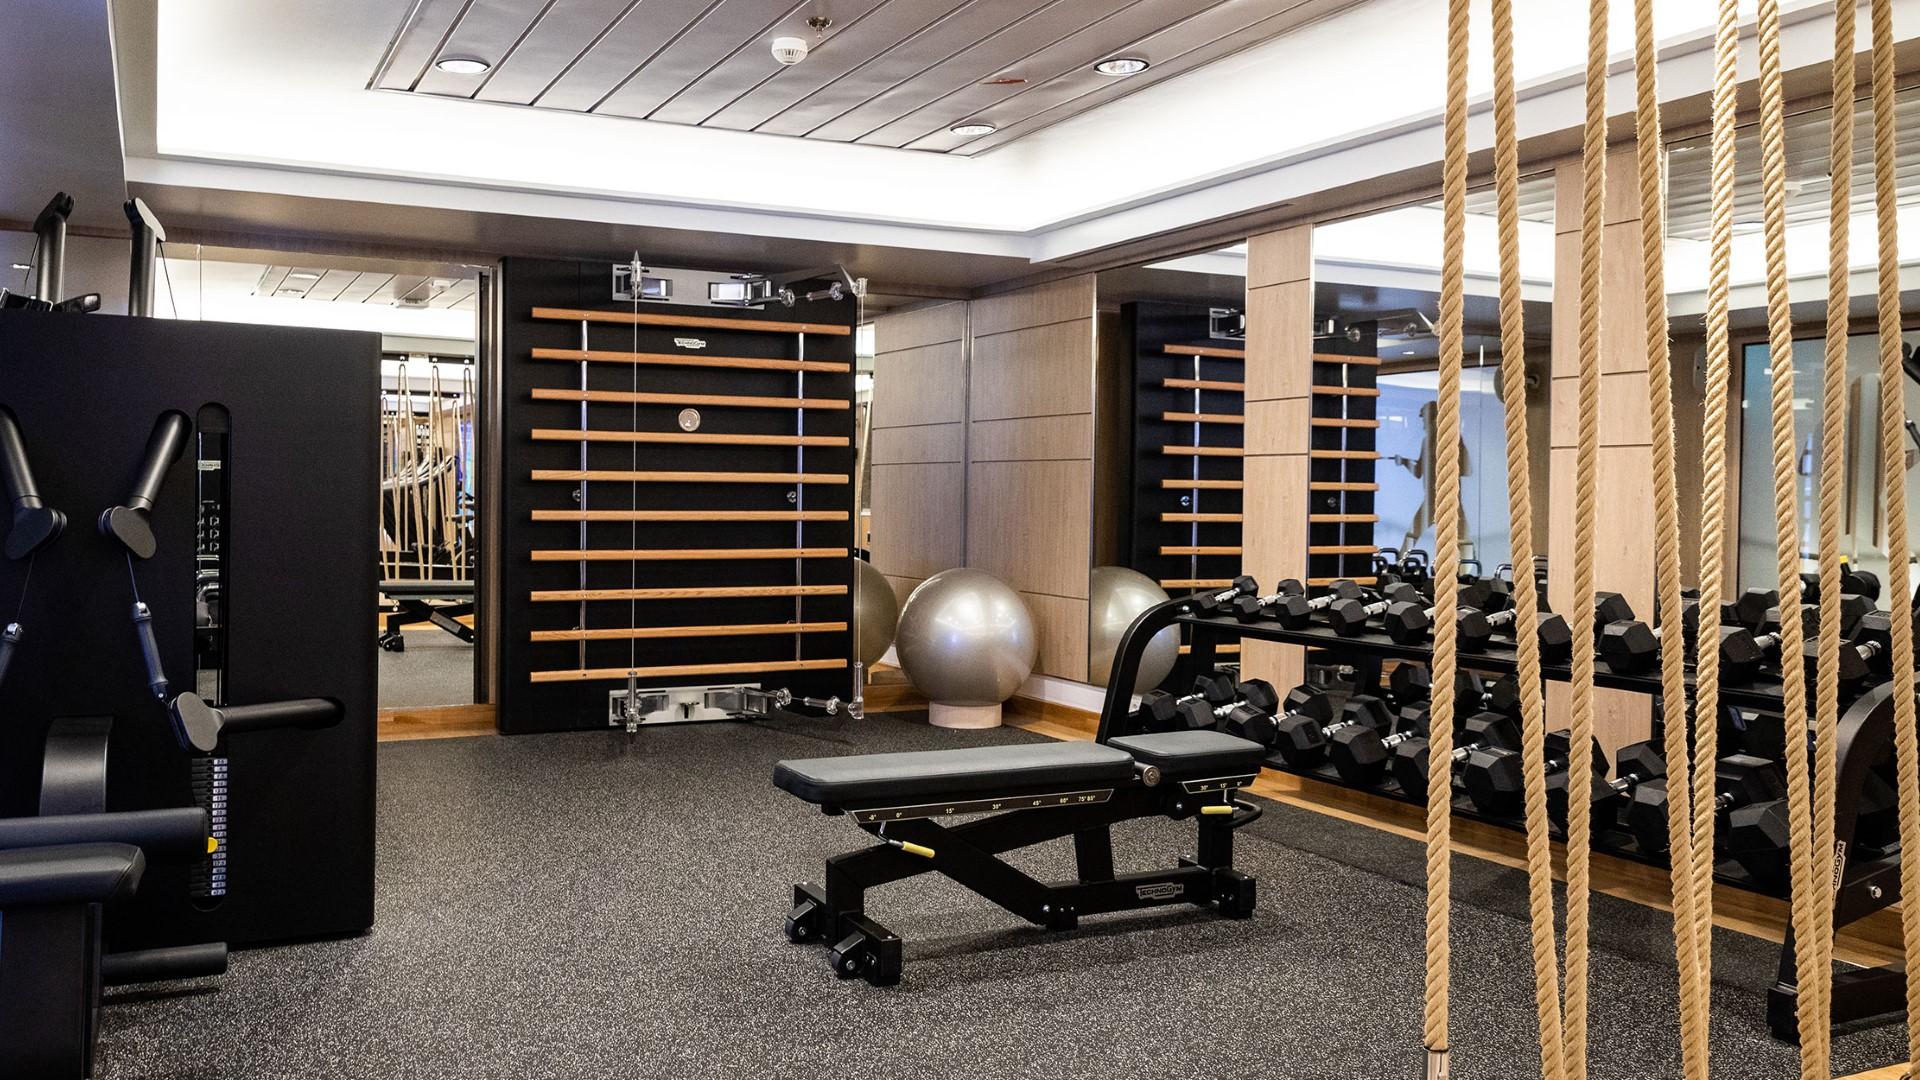 MS Roald Amundsen Gym